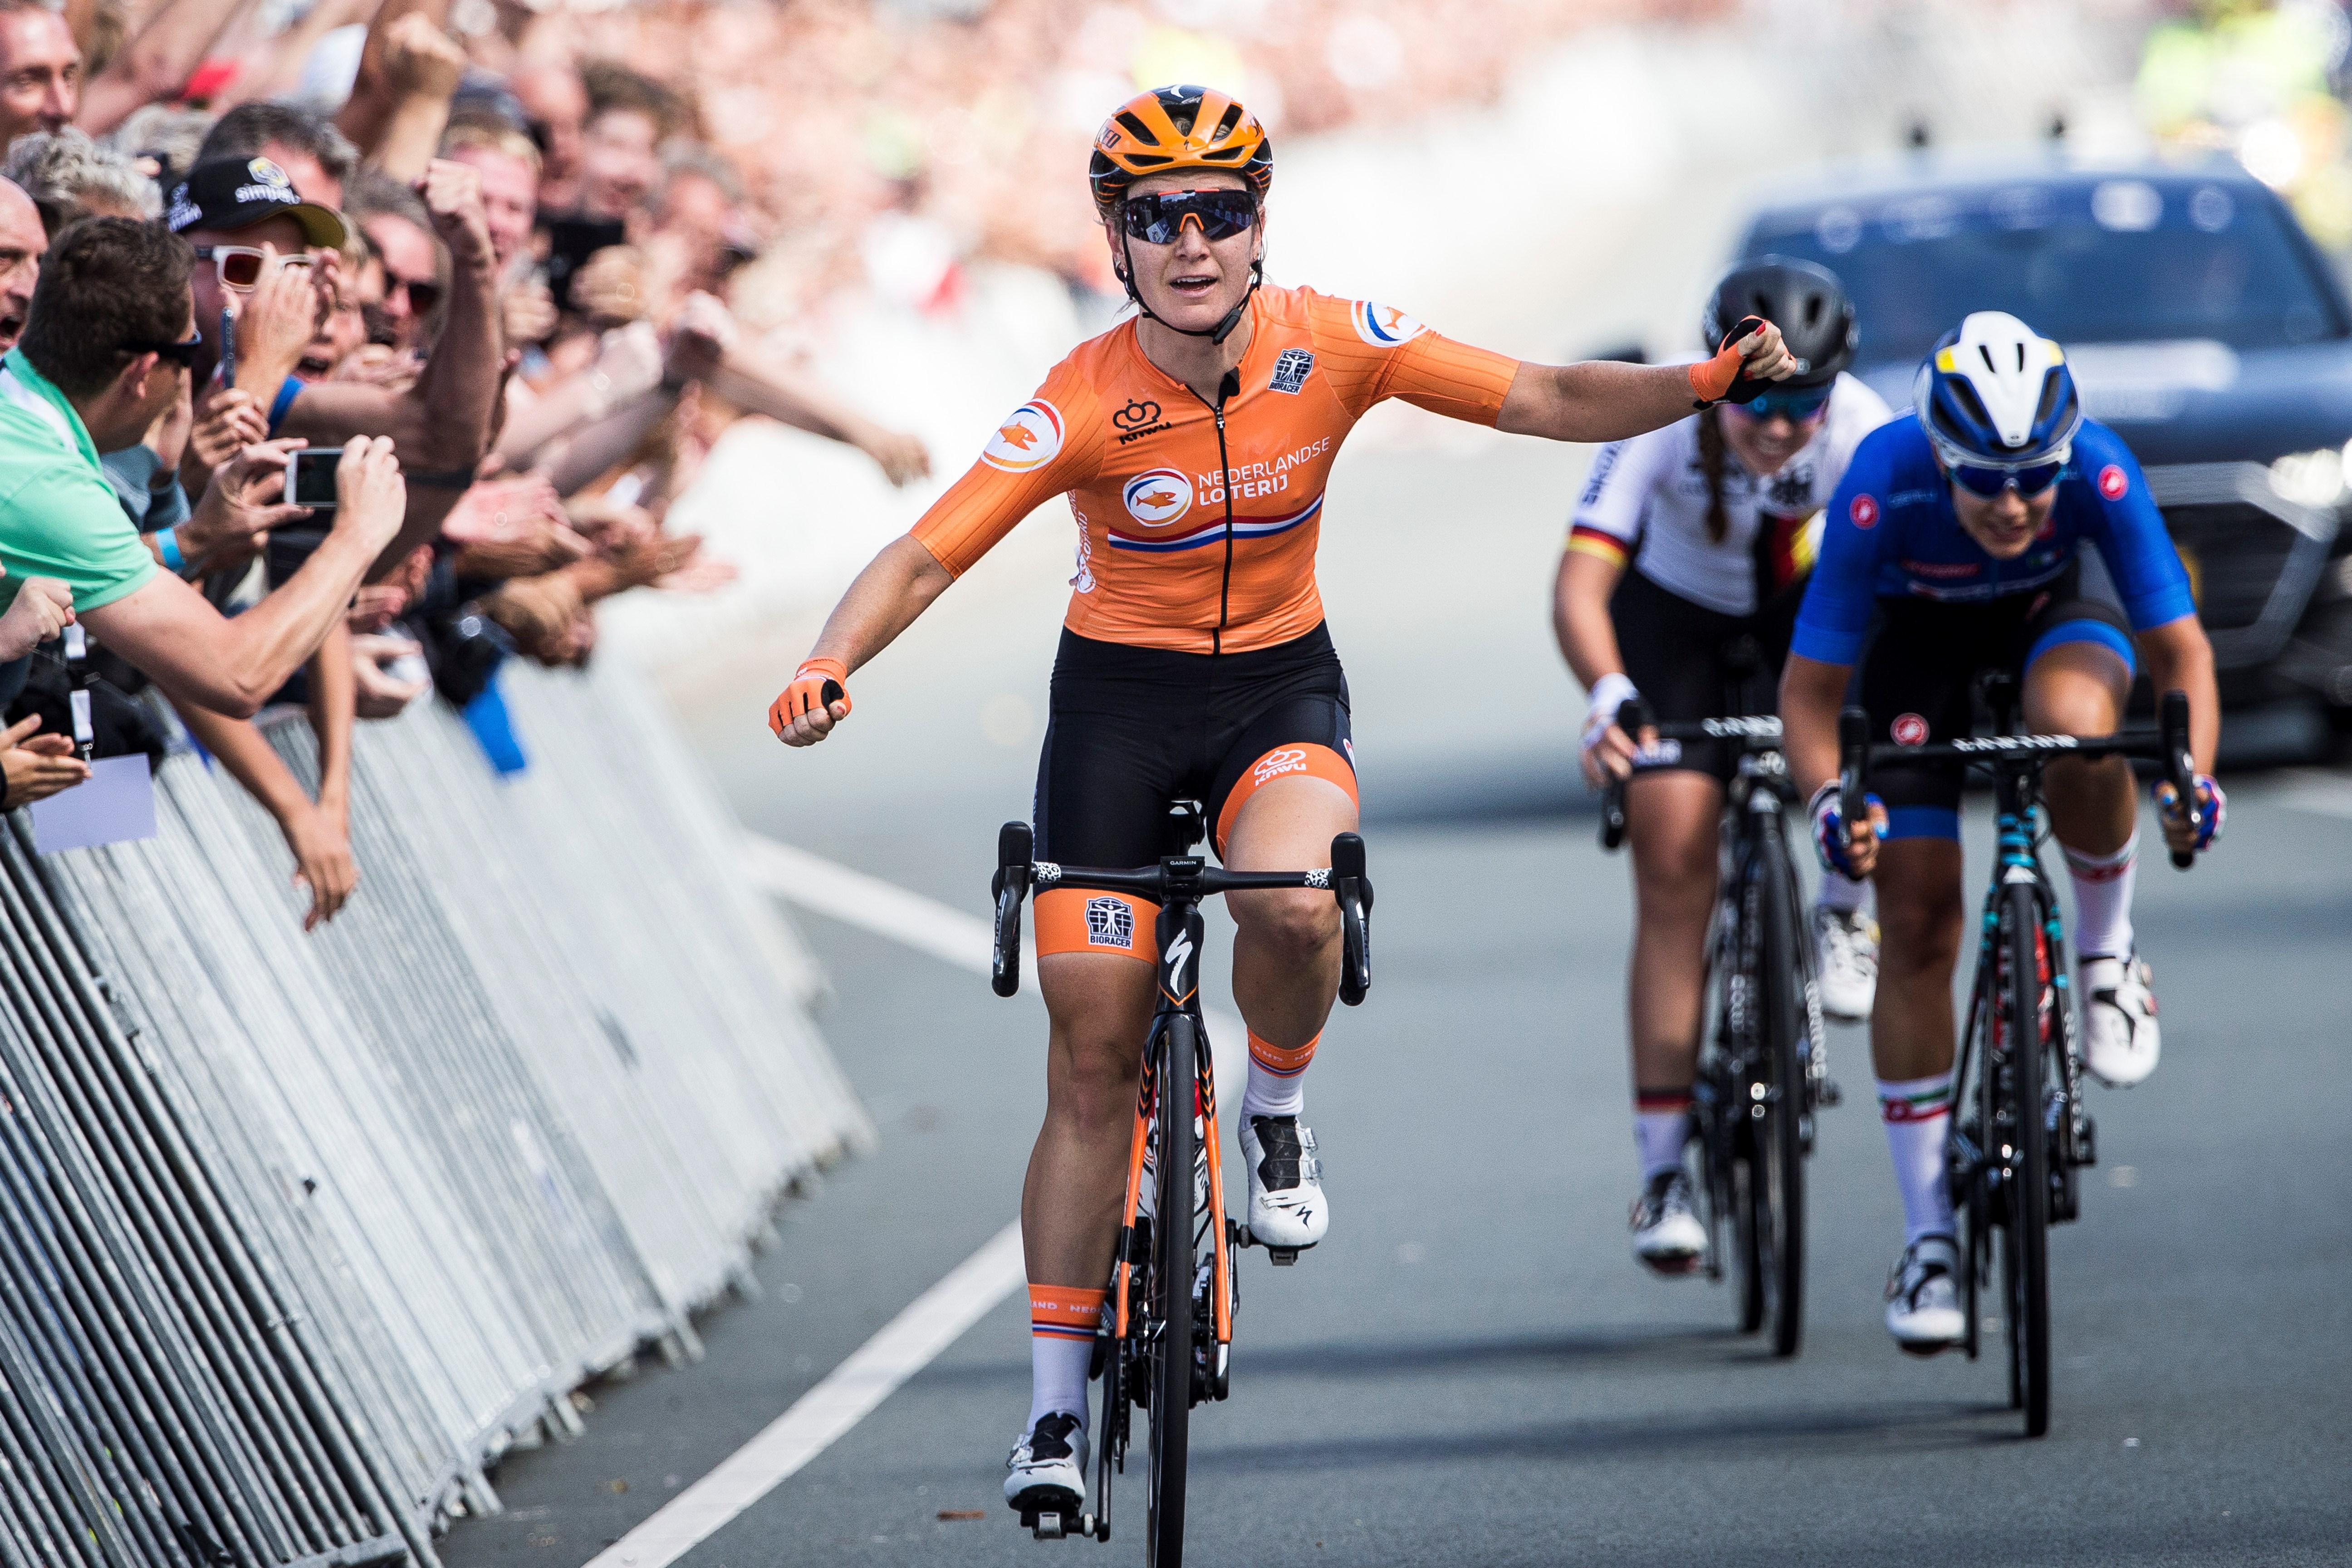 TeamNL-update: EK wielrennen in augustus op agenda